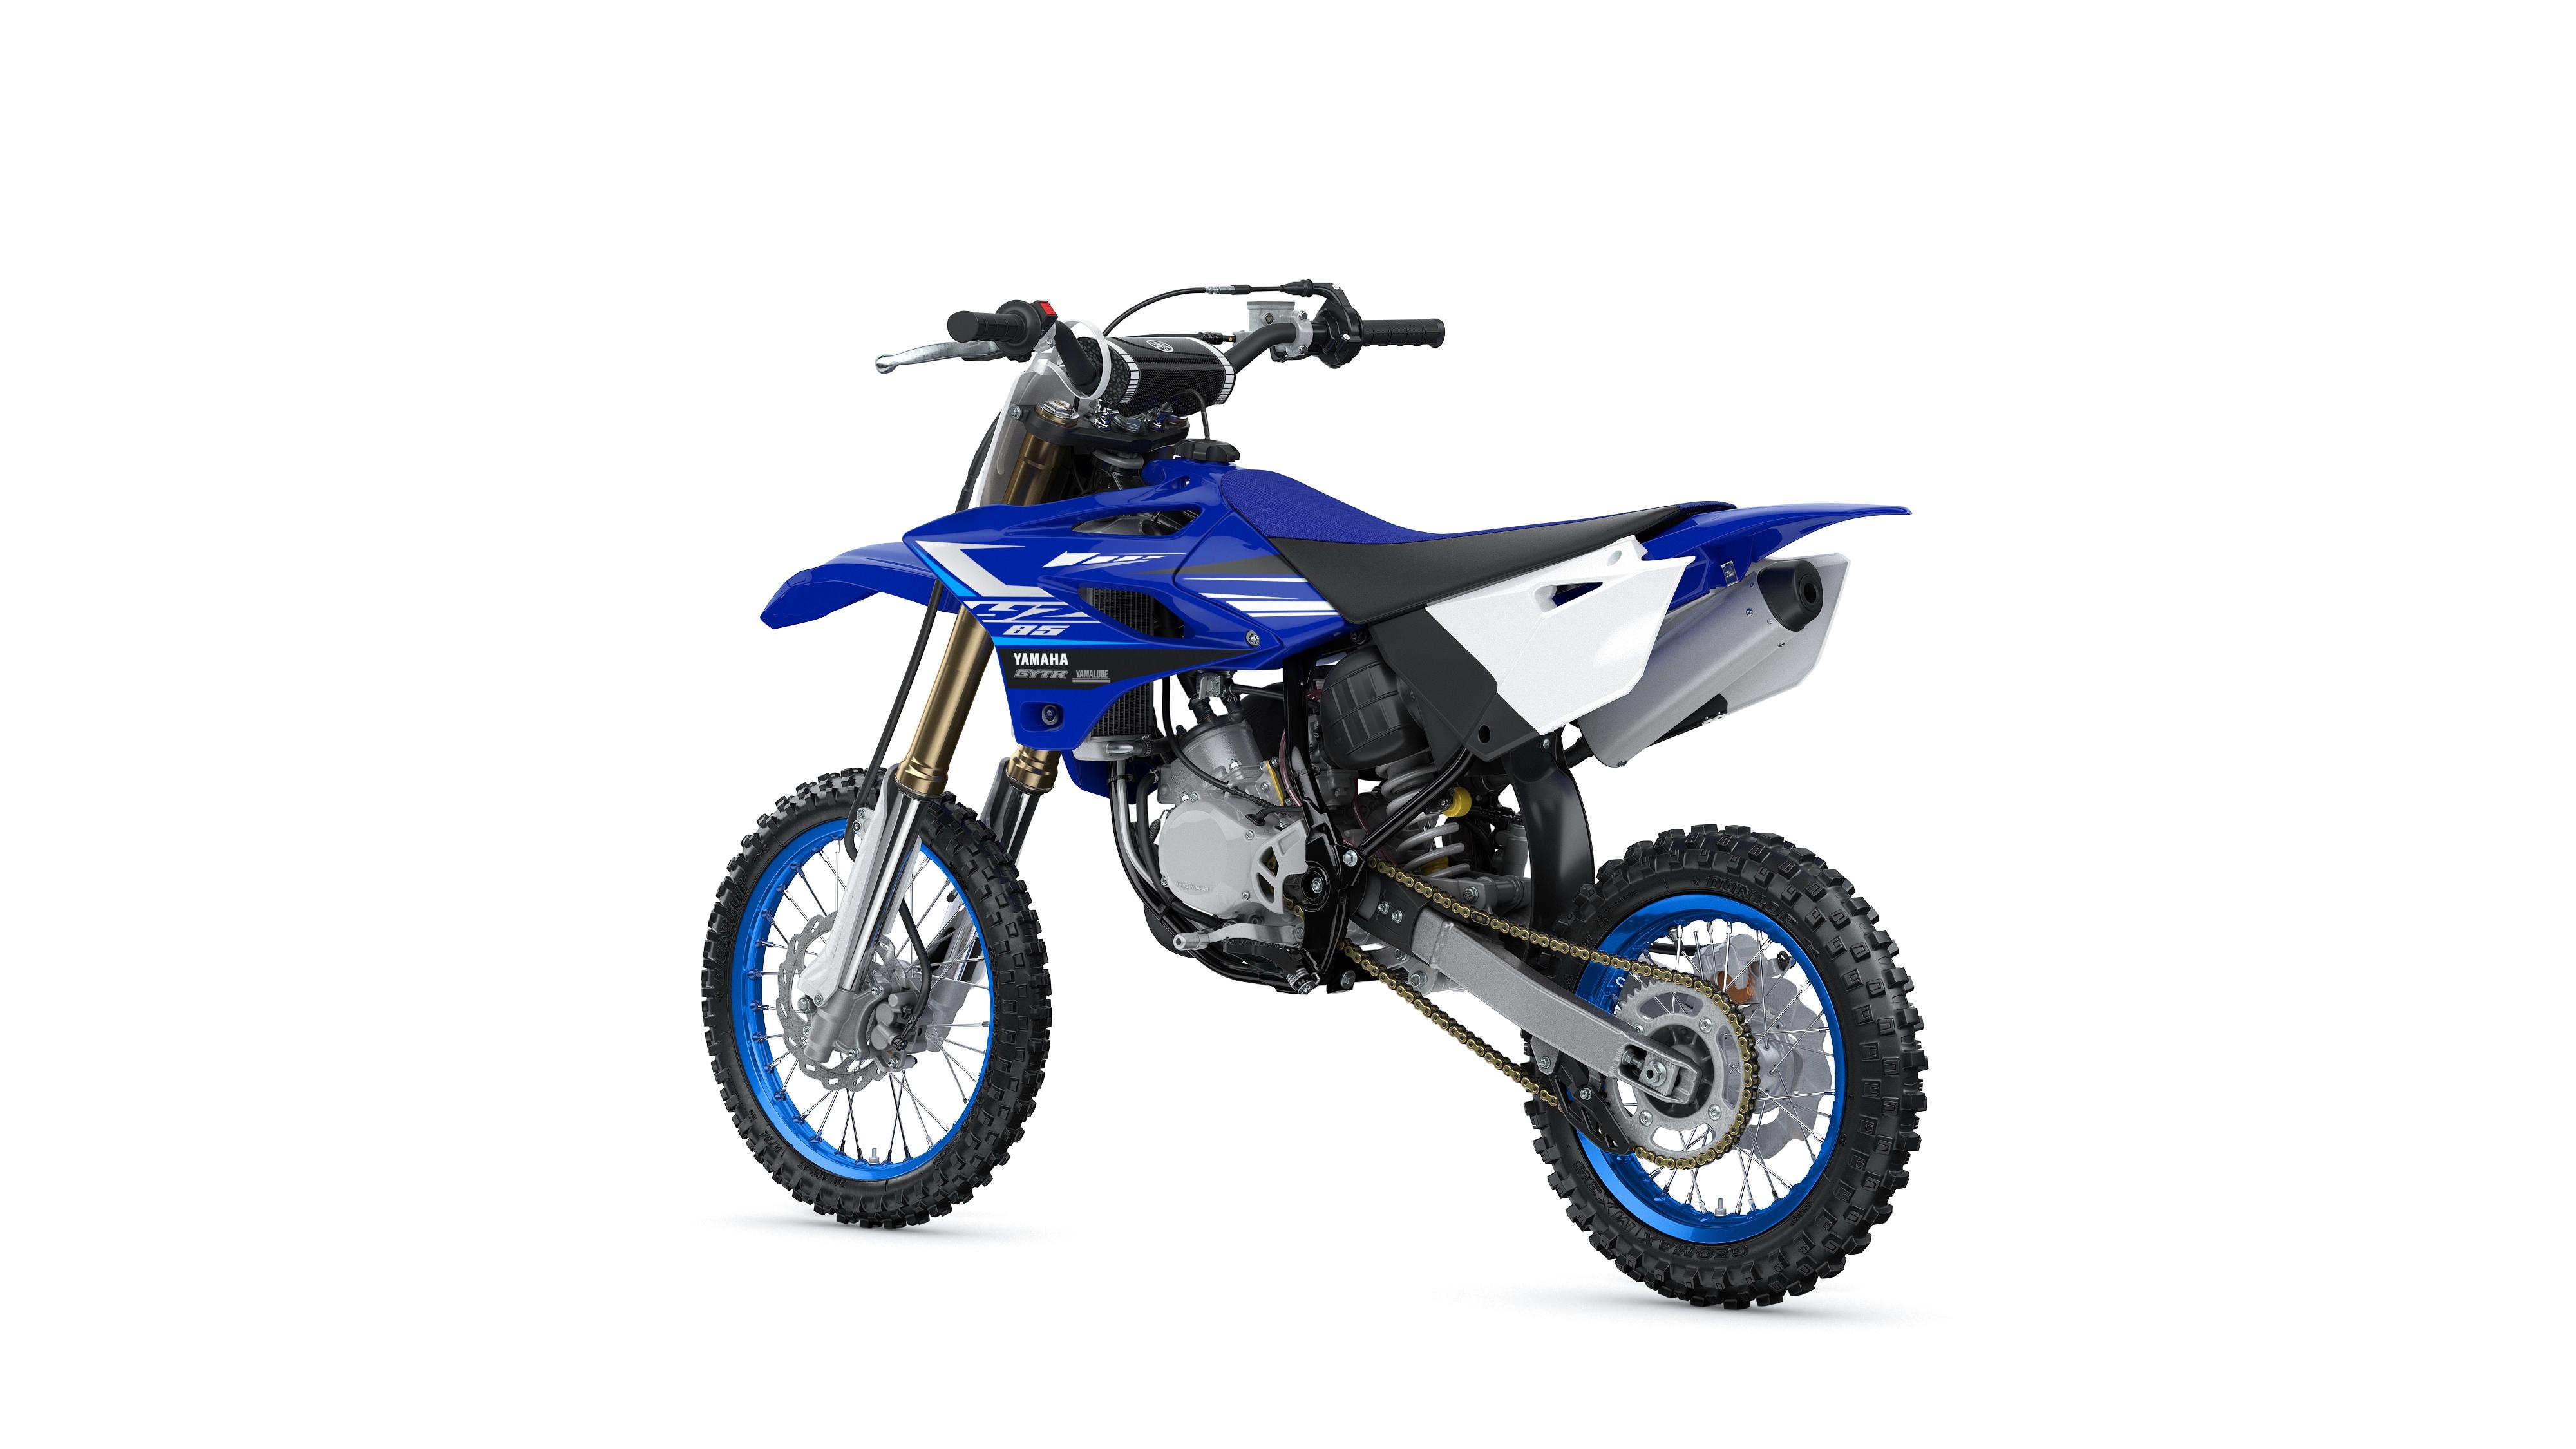 Yamaha YZ125 crossmotor